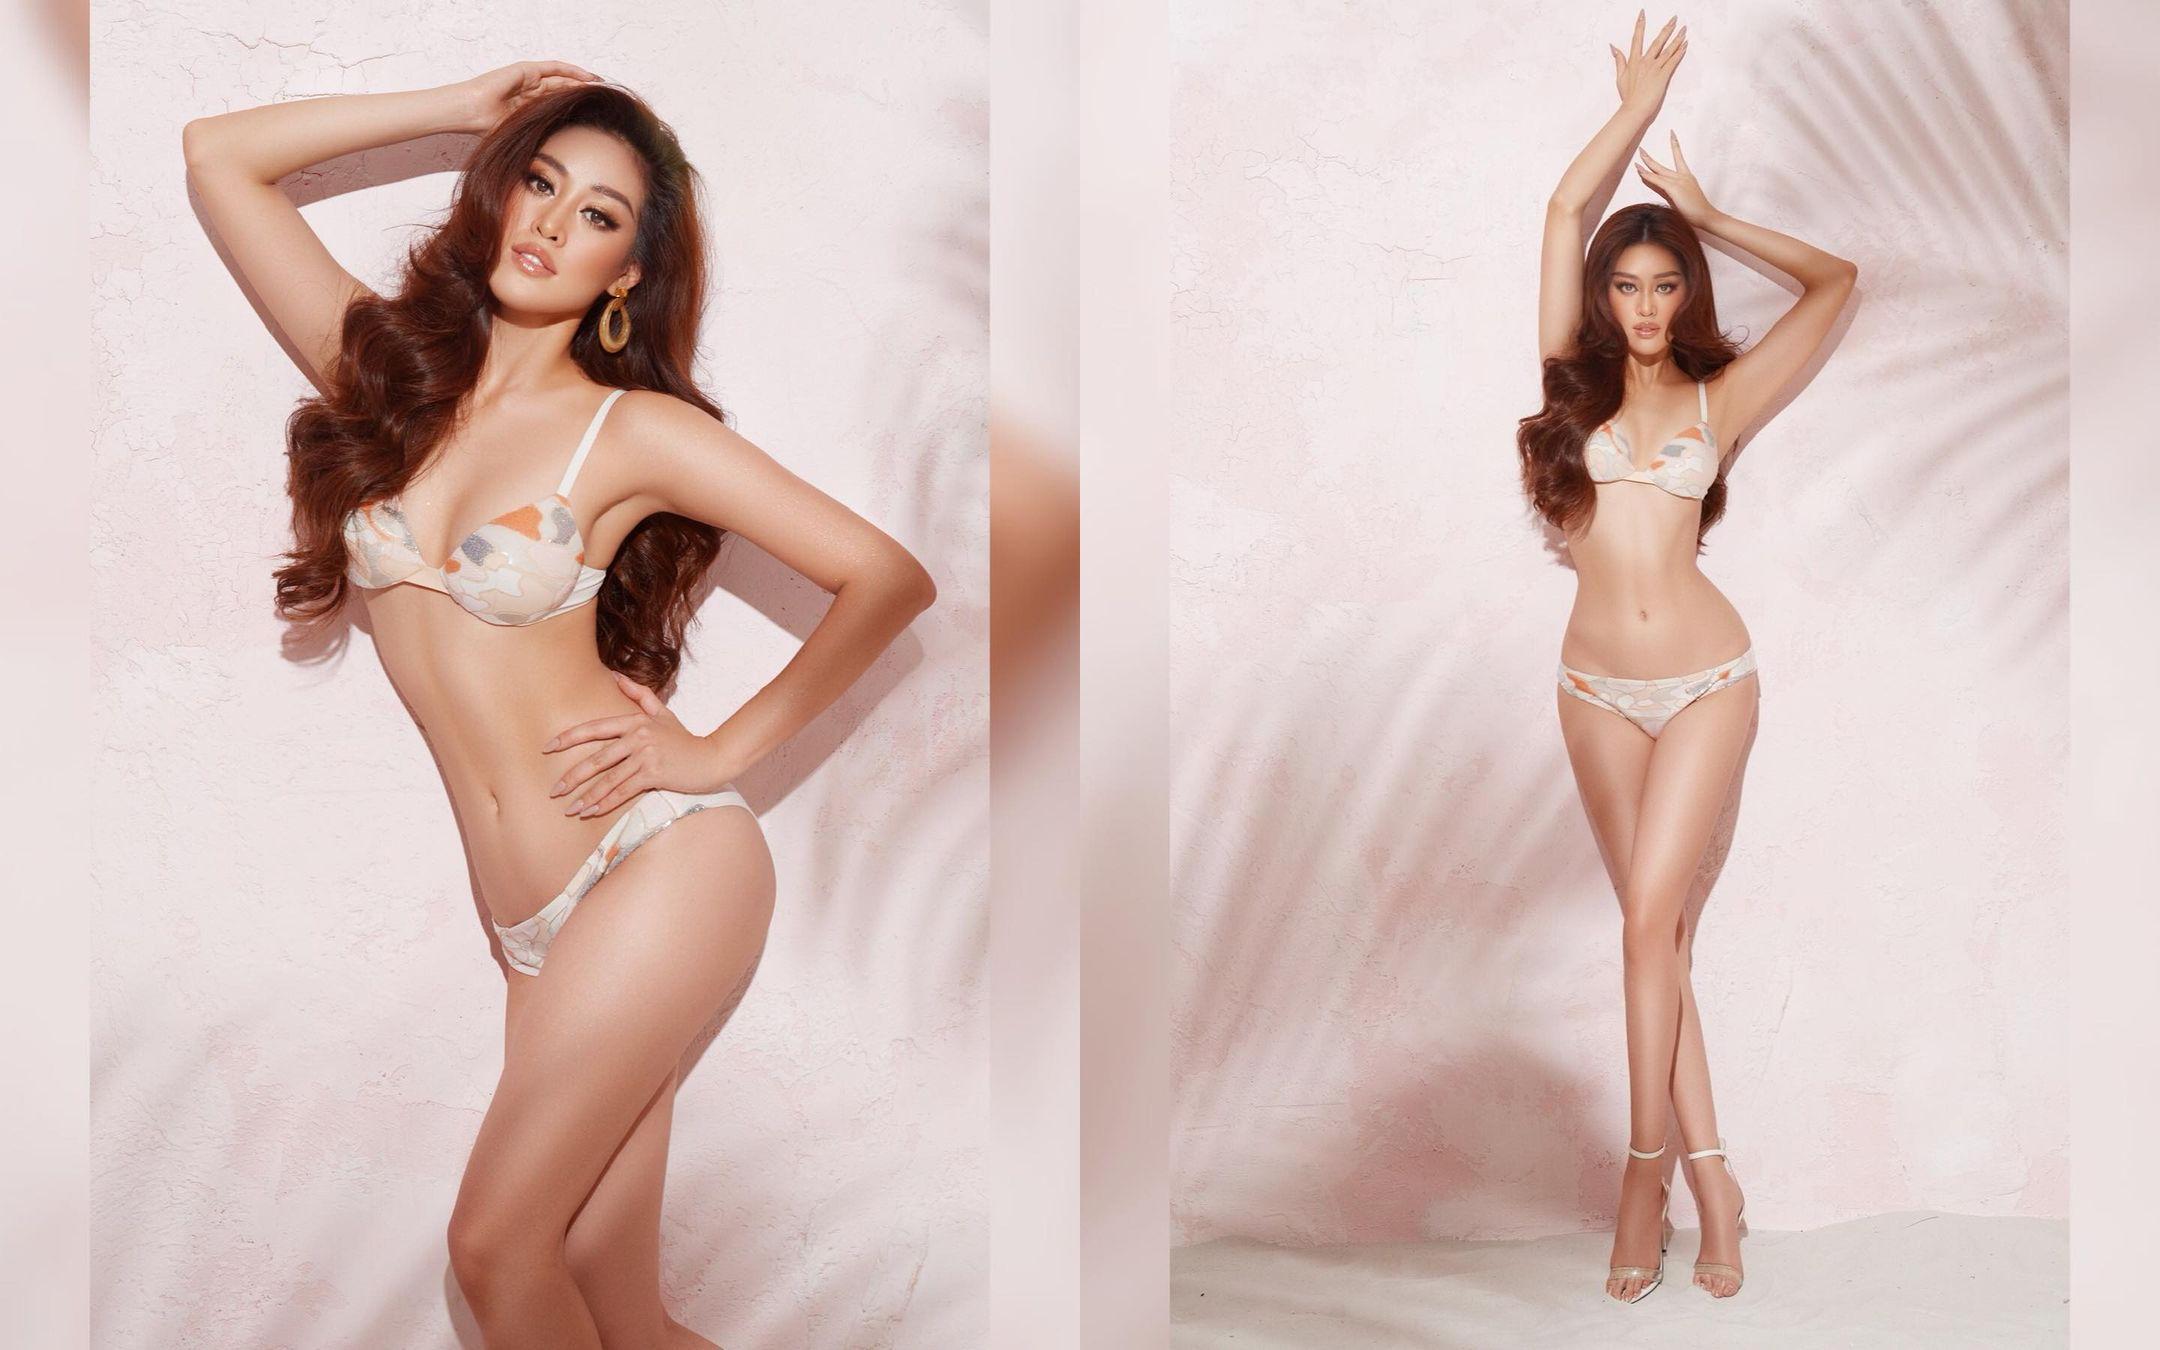 miss vietnam de bikini. 206457639_181928317_222083423051047_14590525366042416_n-jpg-tp-1-_nc_ht-scontent-gig2-1-cd